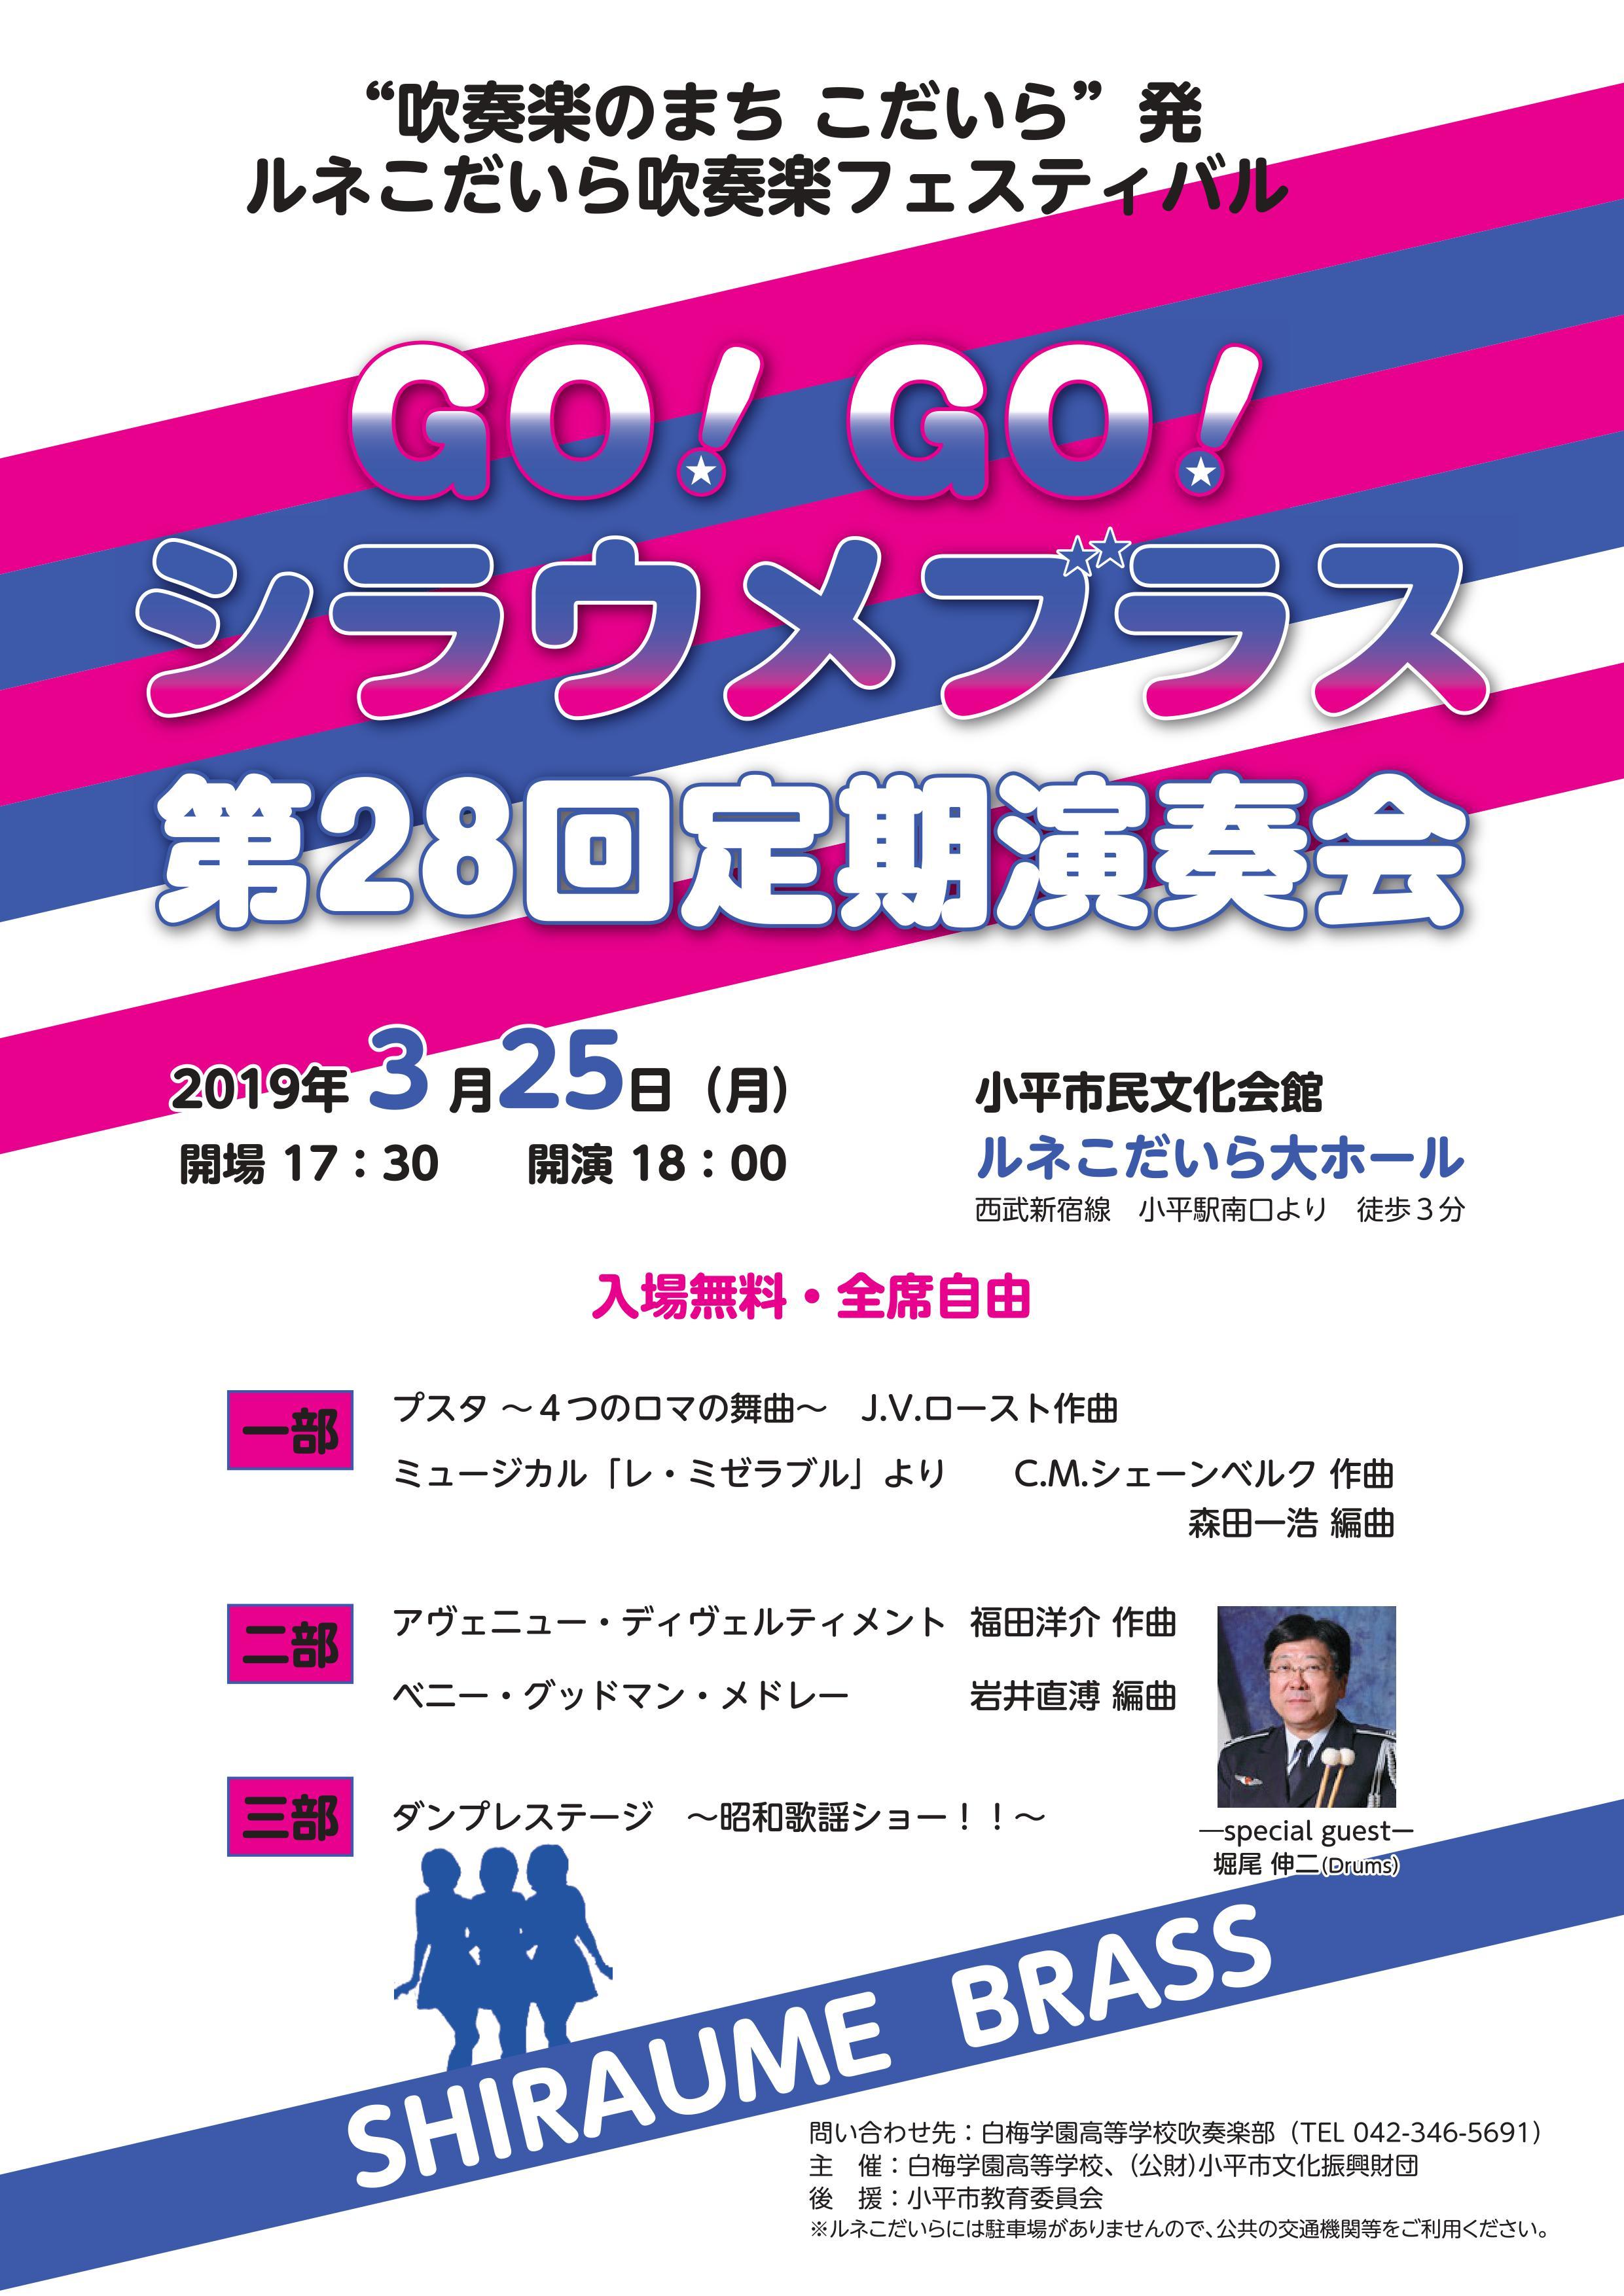 http://highwww.shiraume.ac.jp/info/bnrimages/0001.jpg